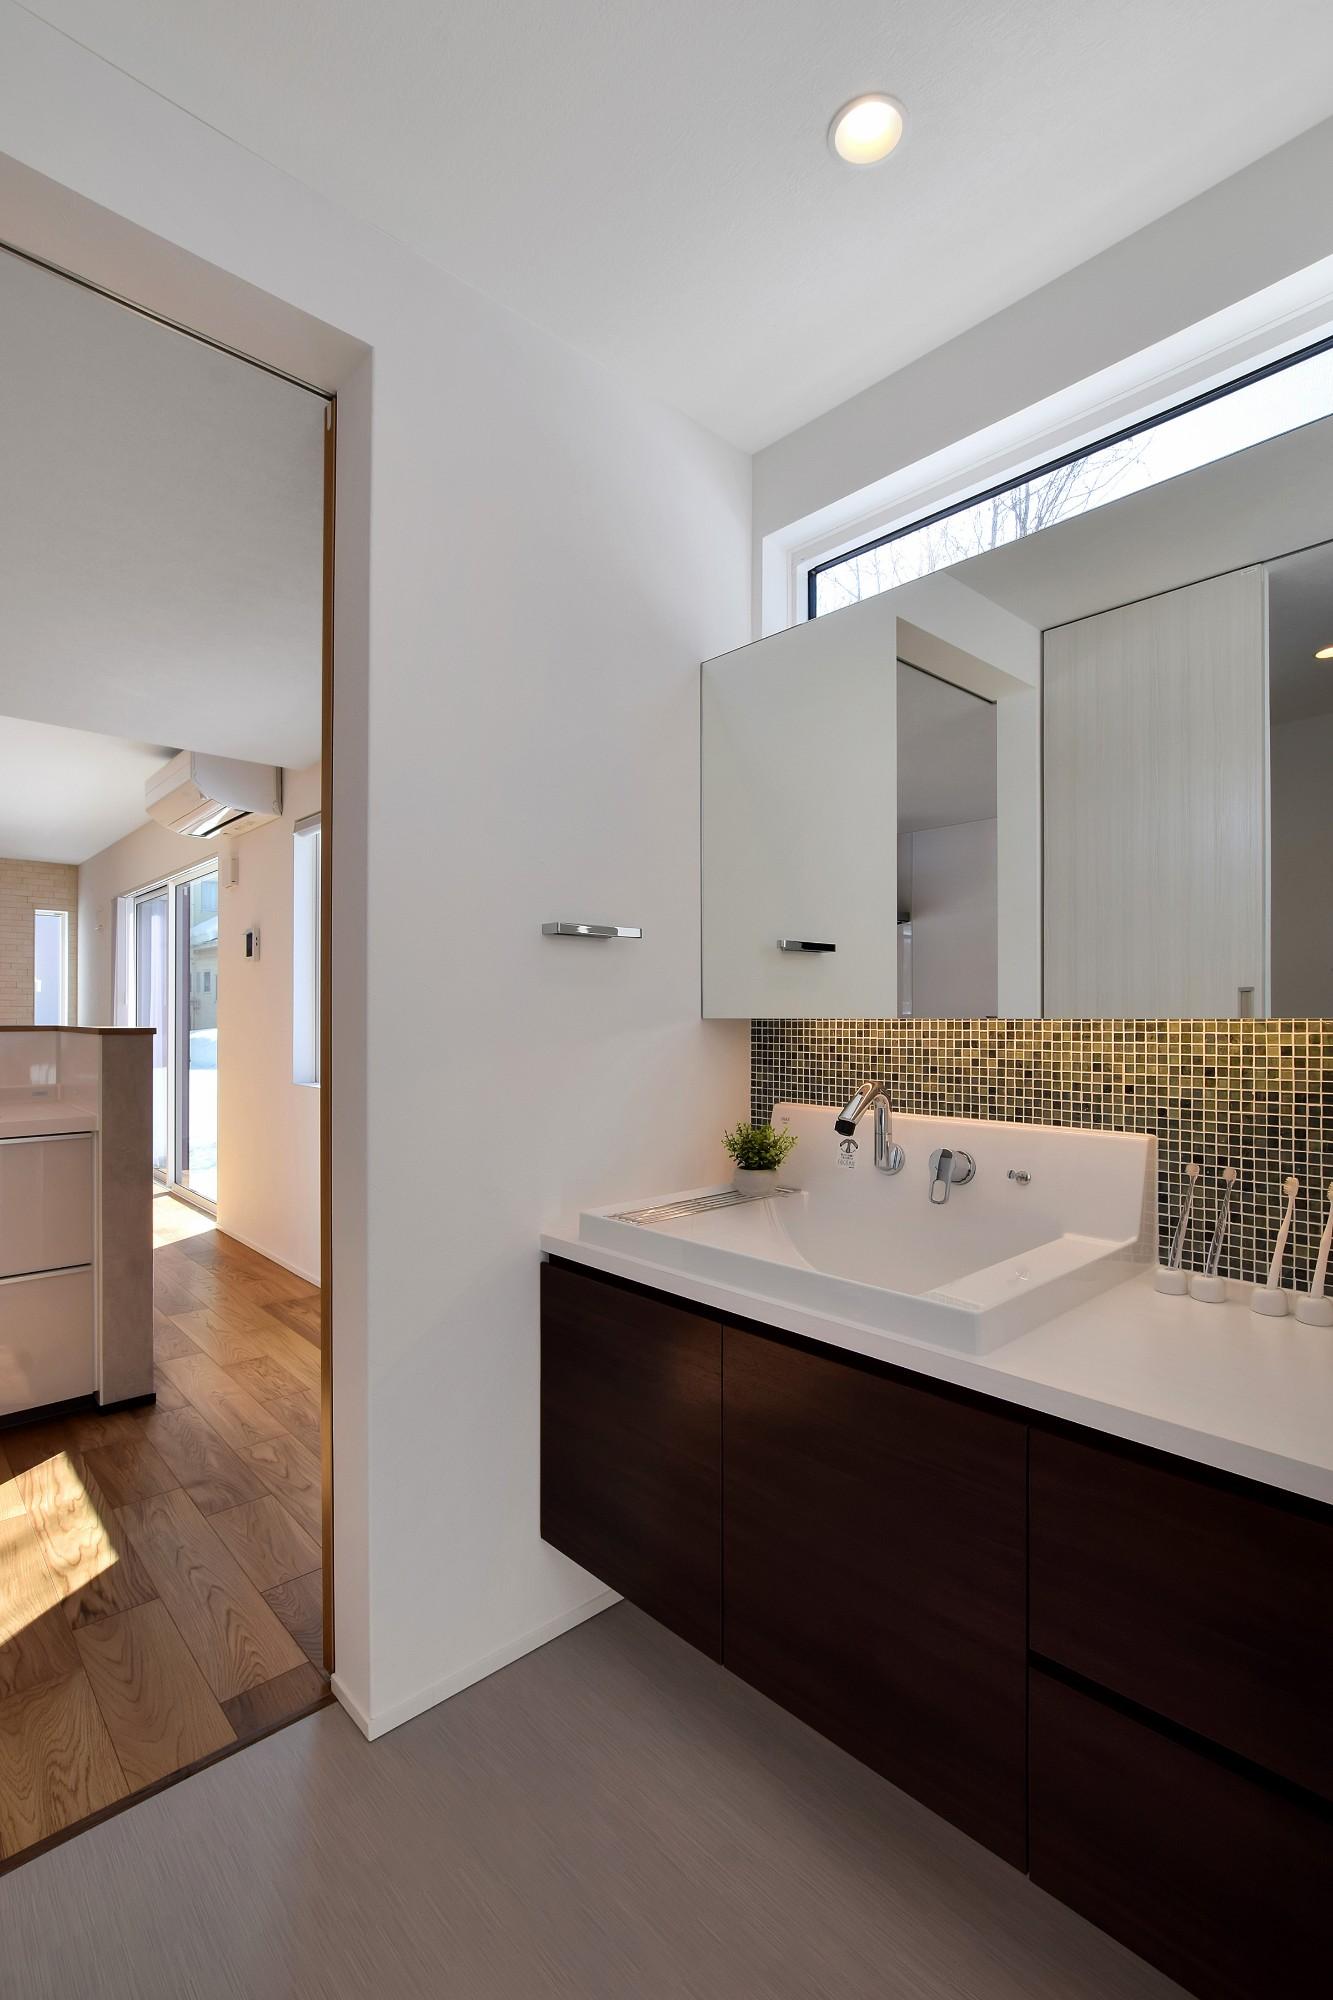 DETAIL HOME(ディテールホーム)「インナーガレージとアルコーブで得るゆとりの住まい」のシンプル・ナチュラルな洗面所・脱衣所の実例写真